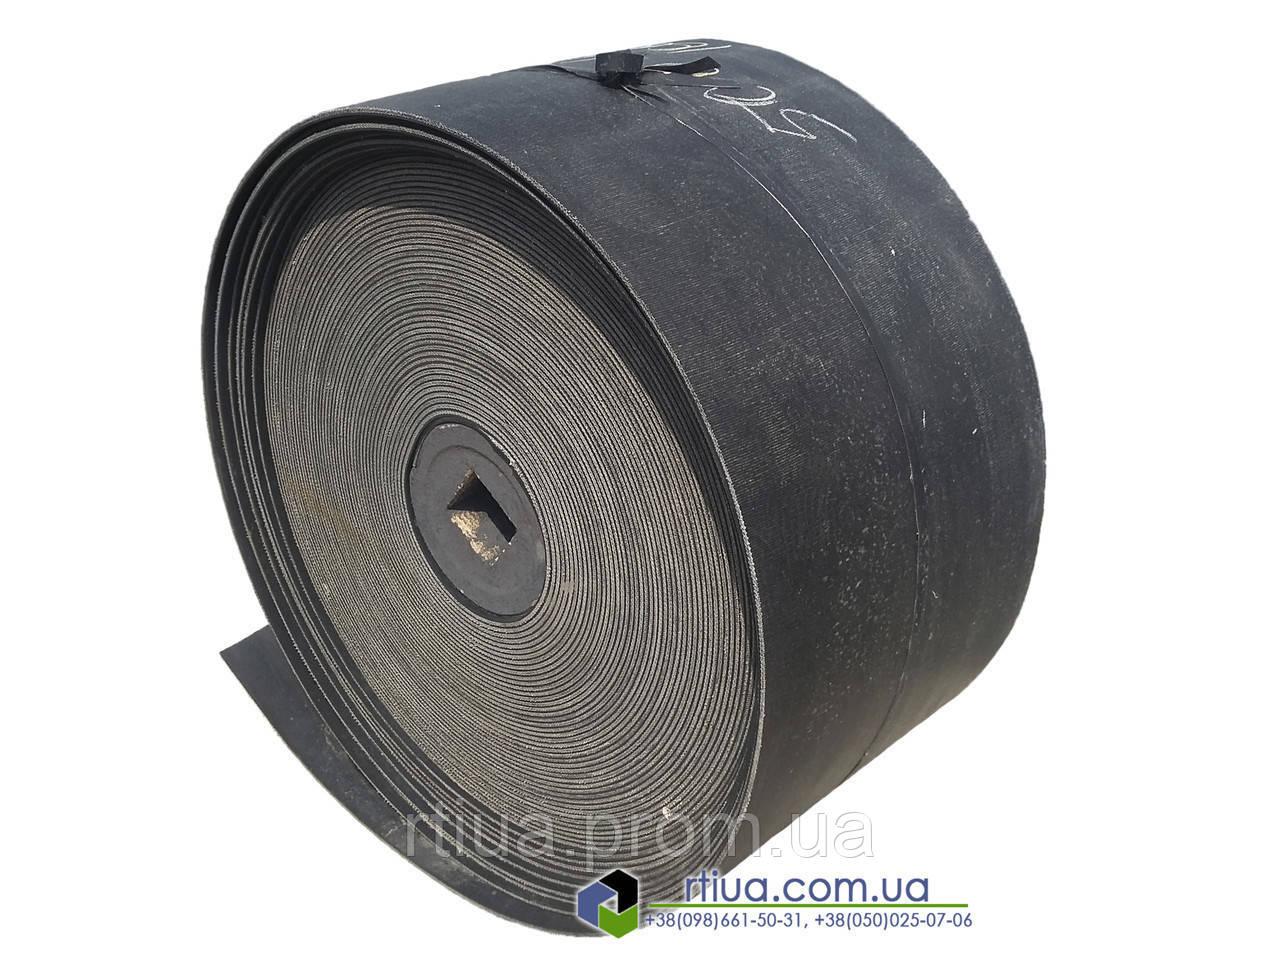 Конвейерная лента 200х4 мм